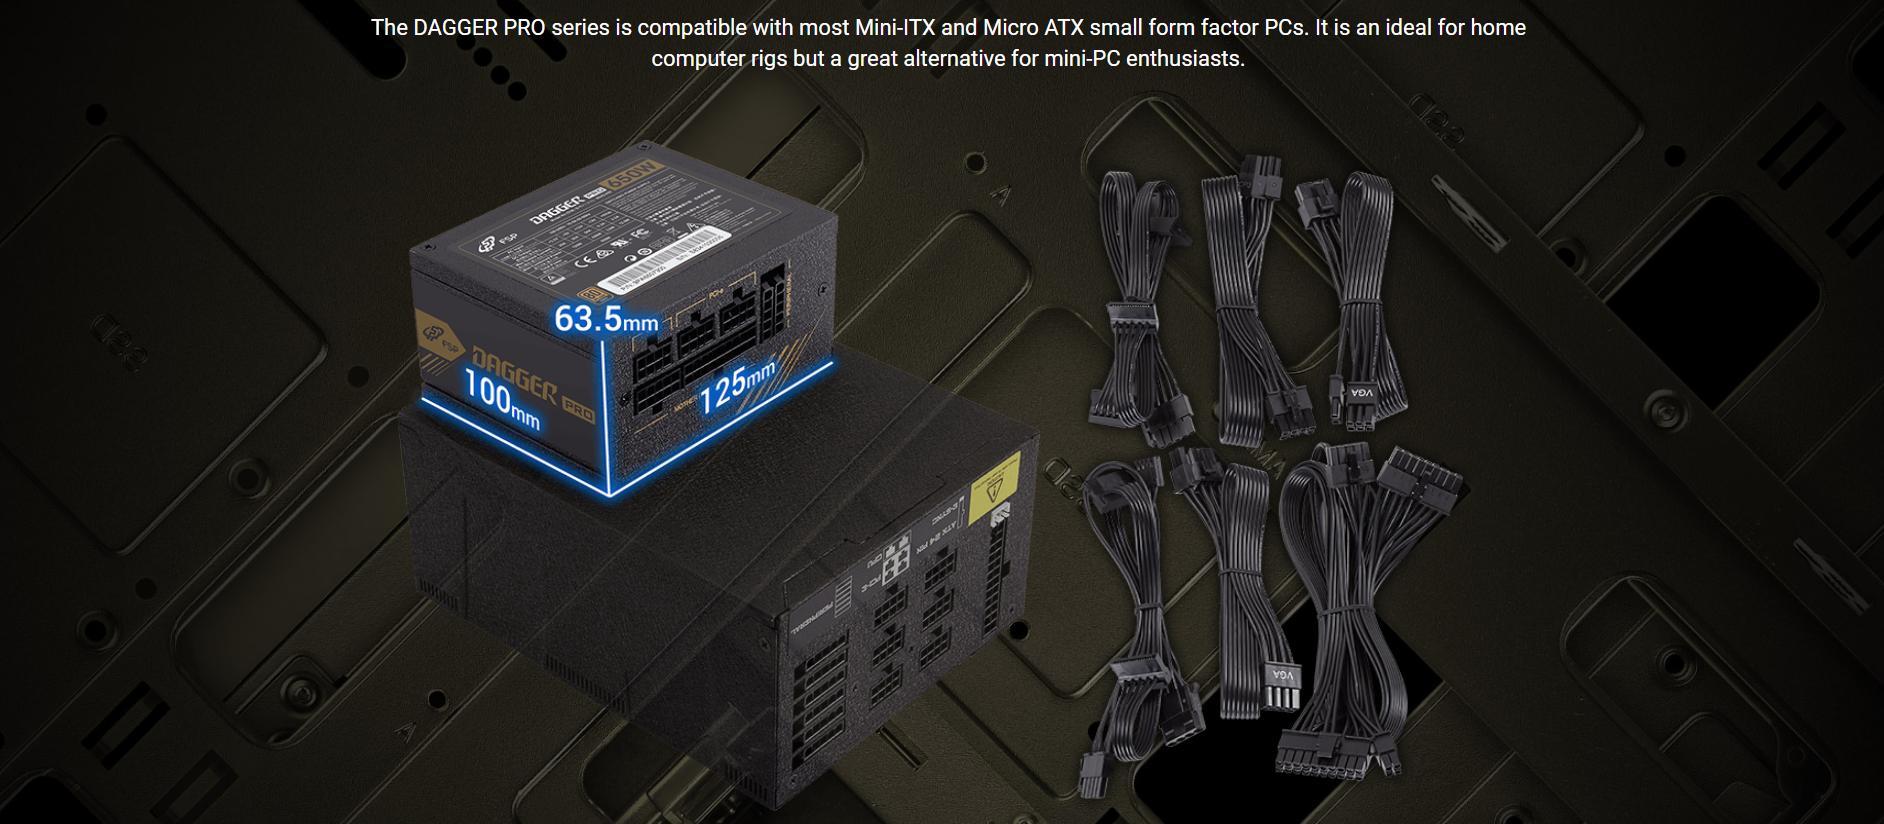 FSP Power Supply DAGGER PRO Series Model SDA2-650 - Active PFC (80 Plus Gold/Full Modular/Màu Đen/SFX) giới thiệu 2